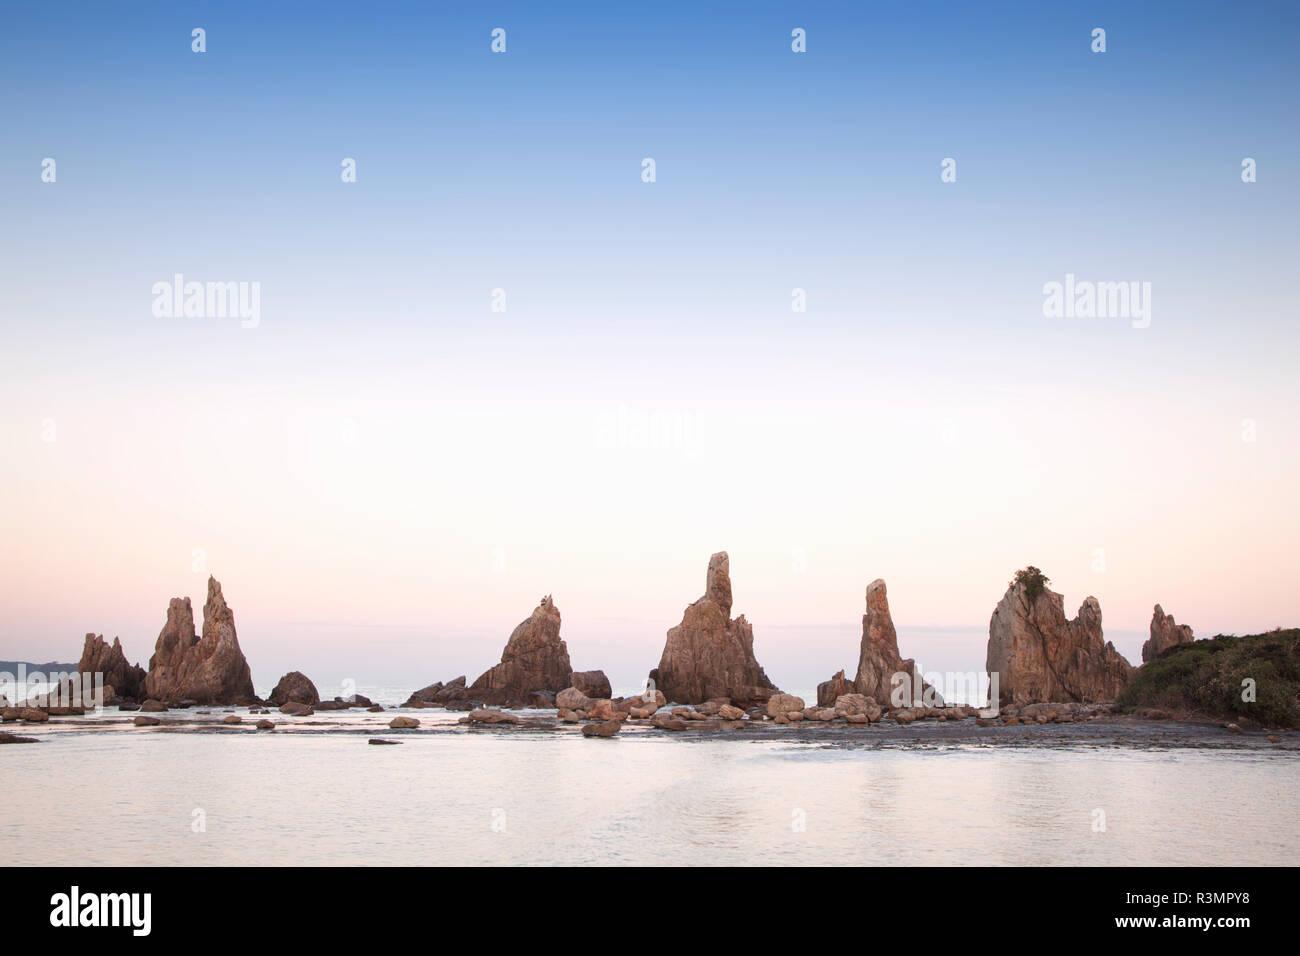 Japan, Wakayama Prefecture. Landscape of Hashigui-iwa Rocks. - Stock Image